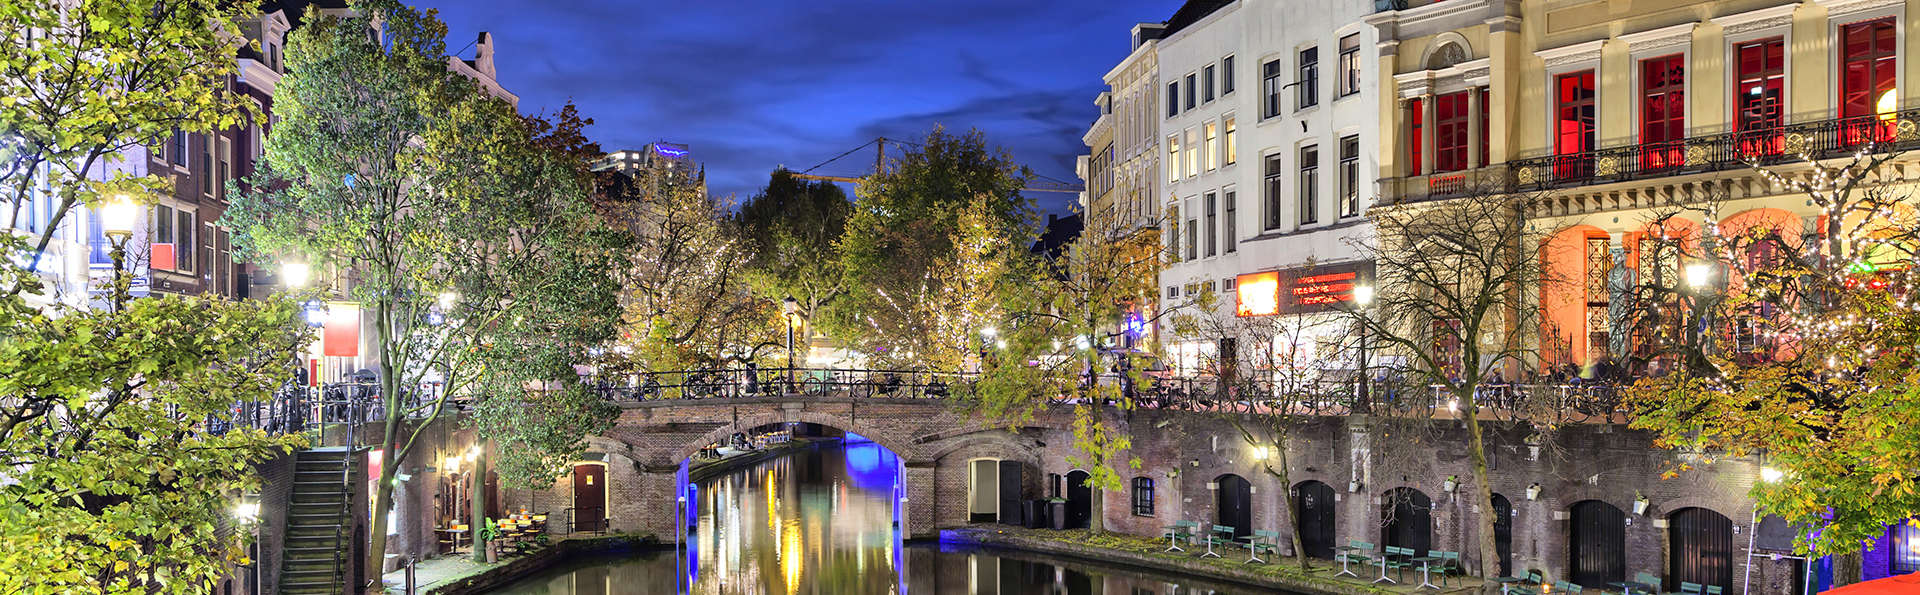 Bastion Hotel Utrecht  - Edit_Utrecht.jpg